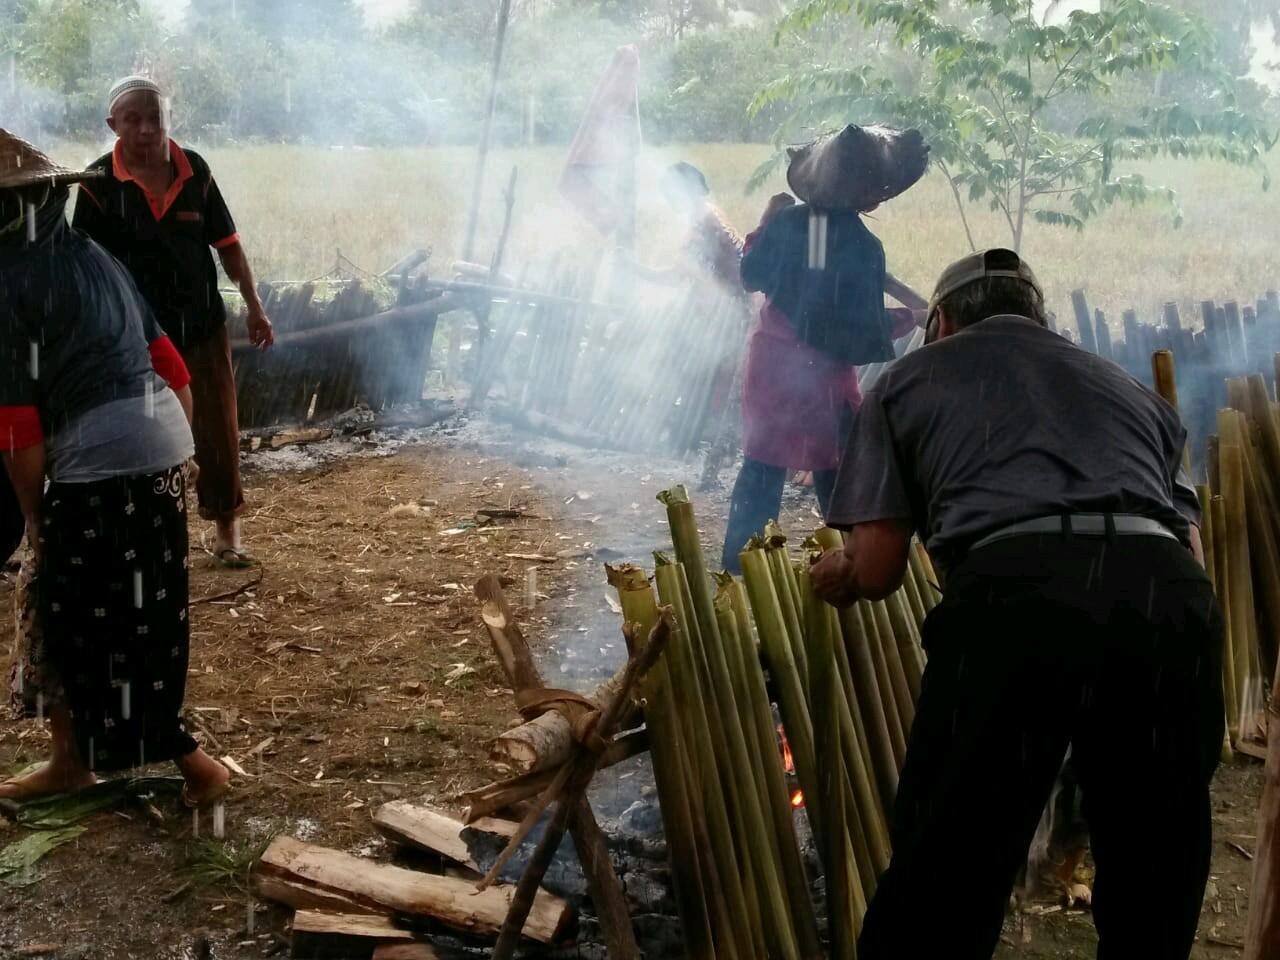 Suasana Pembakaran 1000 Batang Bambu Pewong dalam Acara Pesta Panen Padungku di Desa Manurung, Kec. Malili Kabupaten Luwu Timur